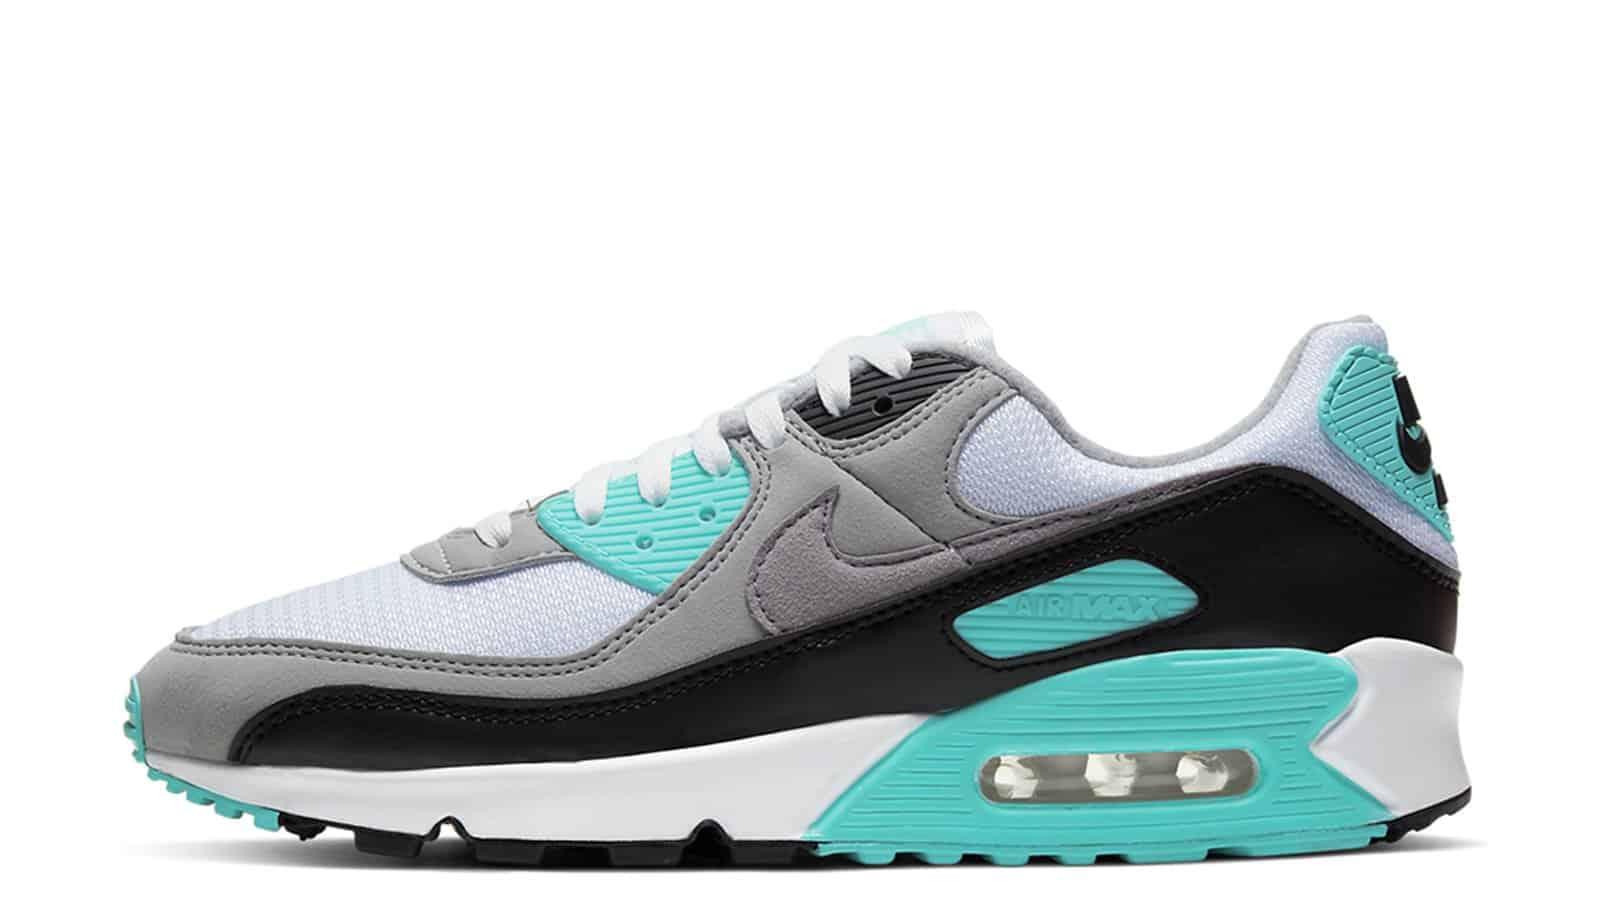 Nike Air Max 90 'Hyper Turquoise'